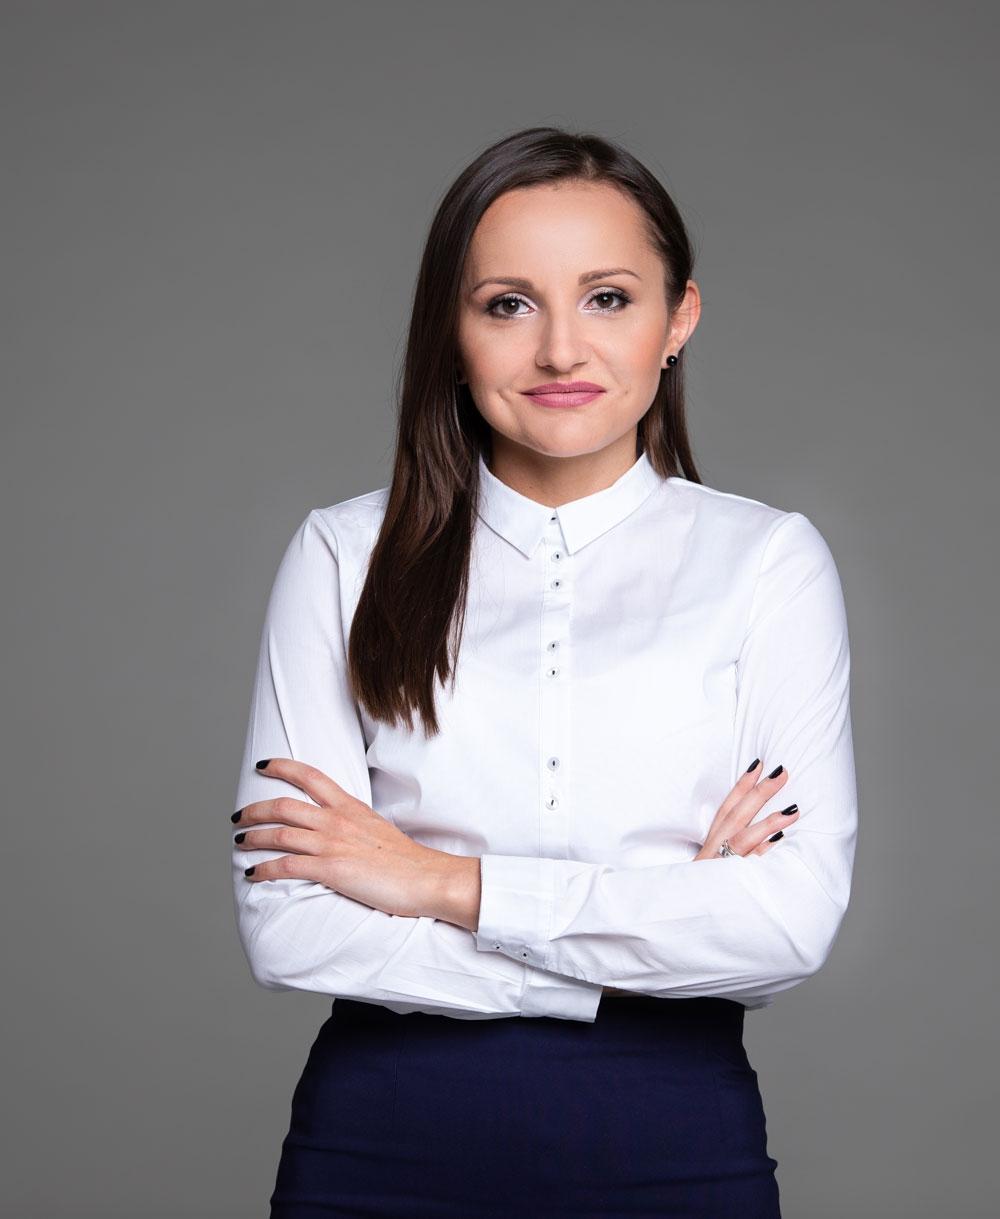 adwokat Ewa Biernacka-Buksza